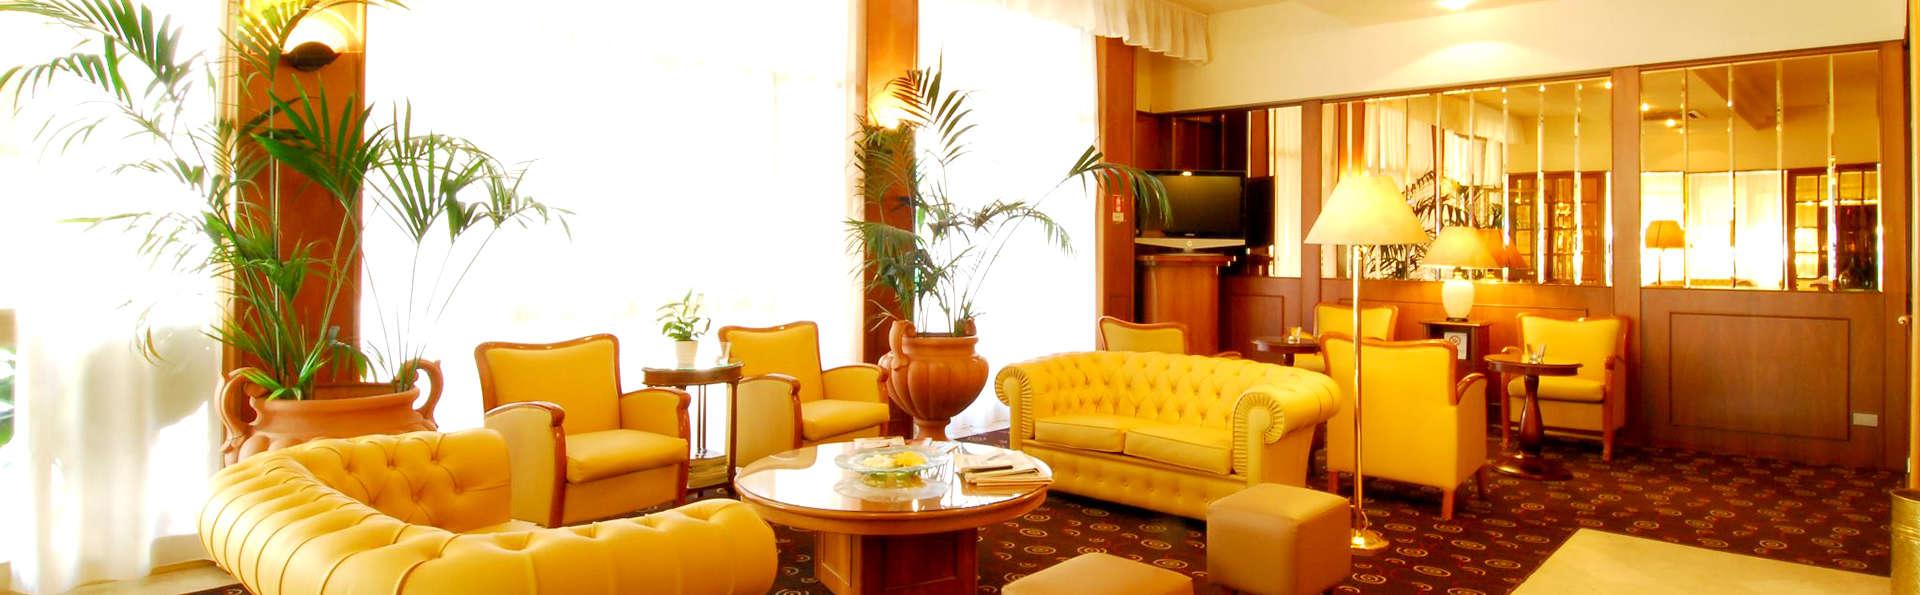 Hotel Perù Ambienthotels - Edit_Hall2.jpg